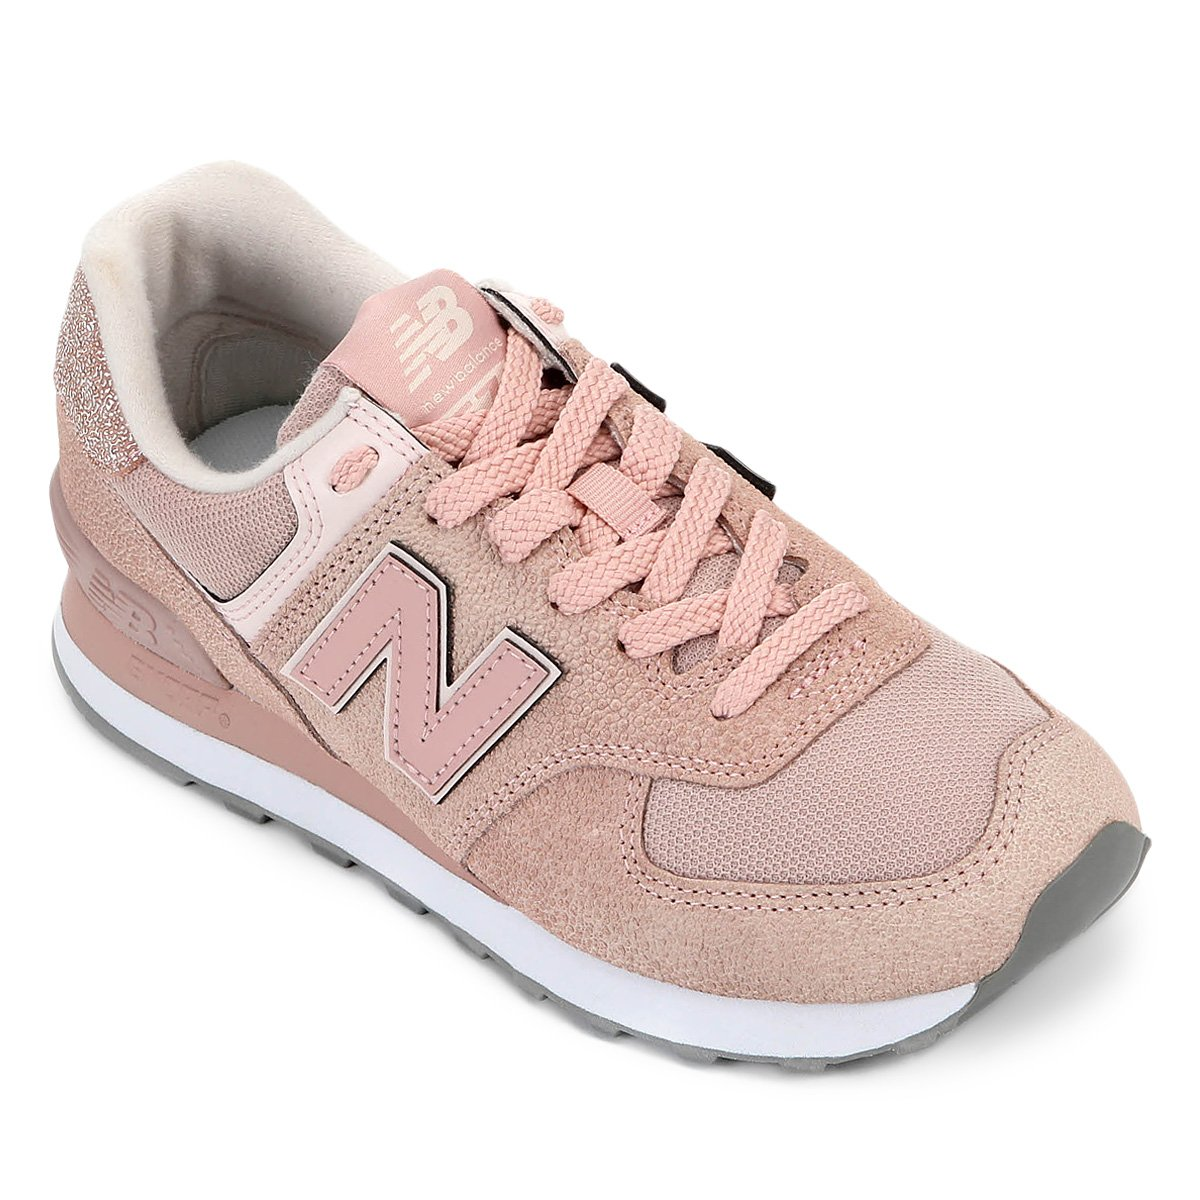 new product 87234 8aec8 Tênis New Balance 574 Feminino - Rosa e Branco